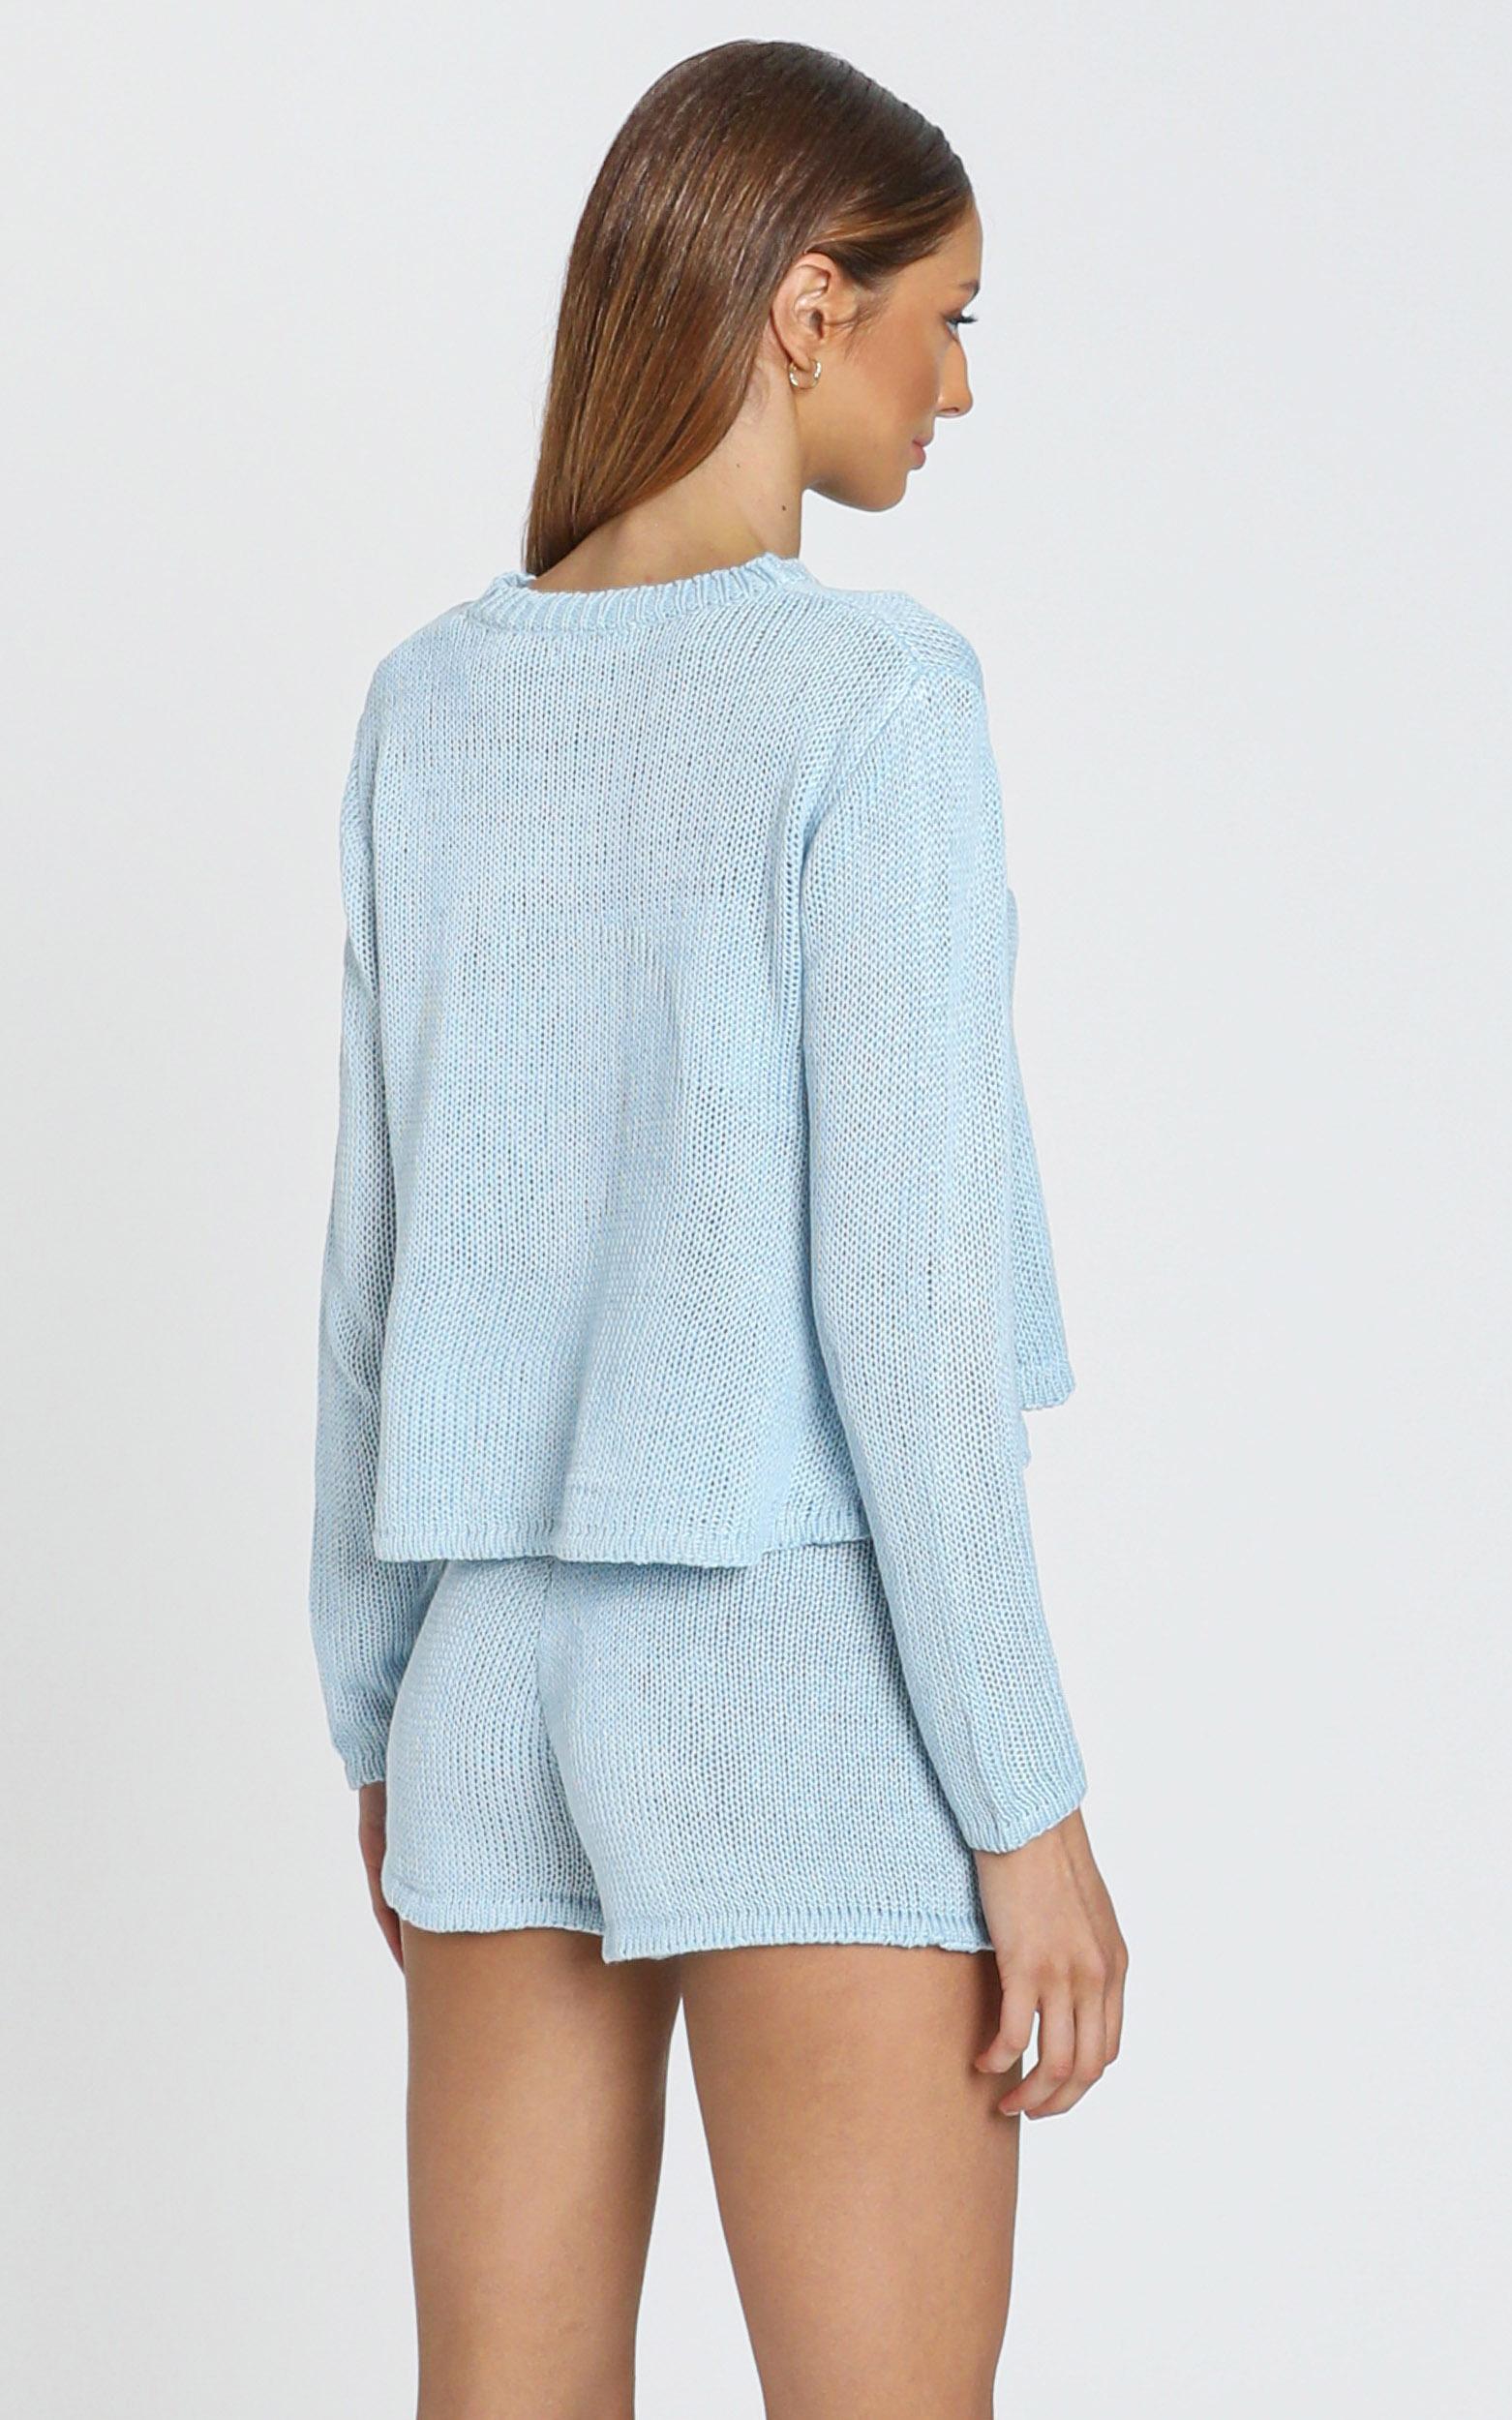 Lenka Knit two piece set in Blue - S, Blue, hi-res image number null